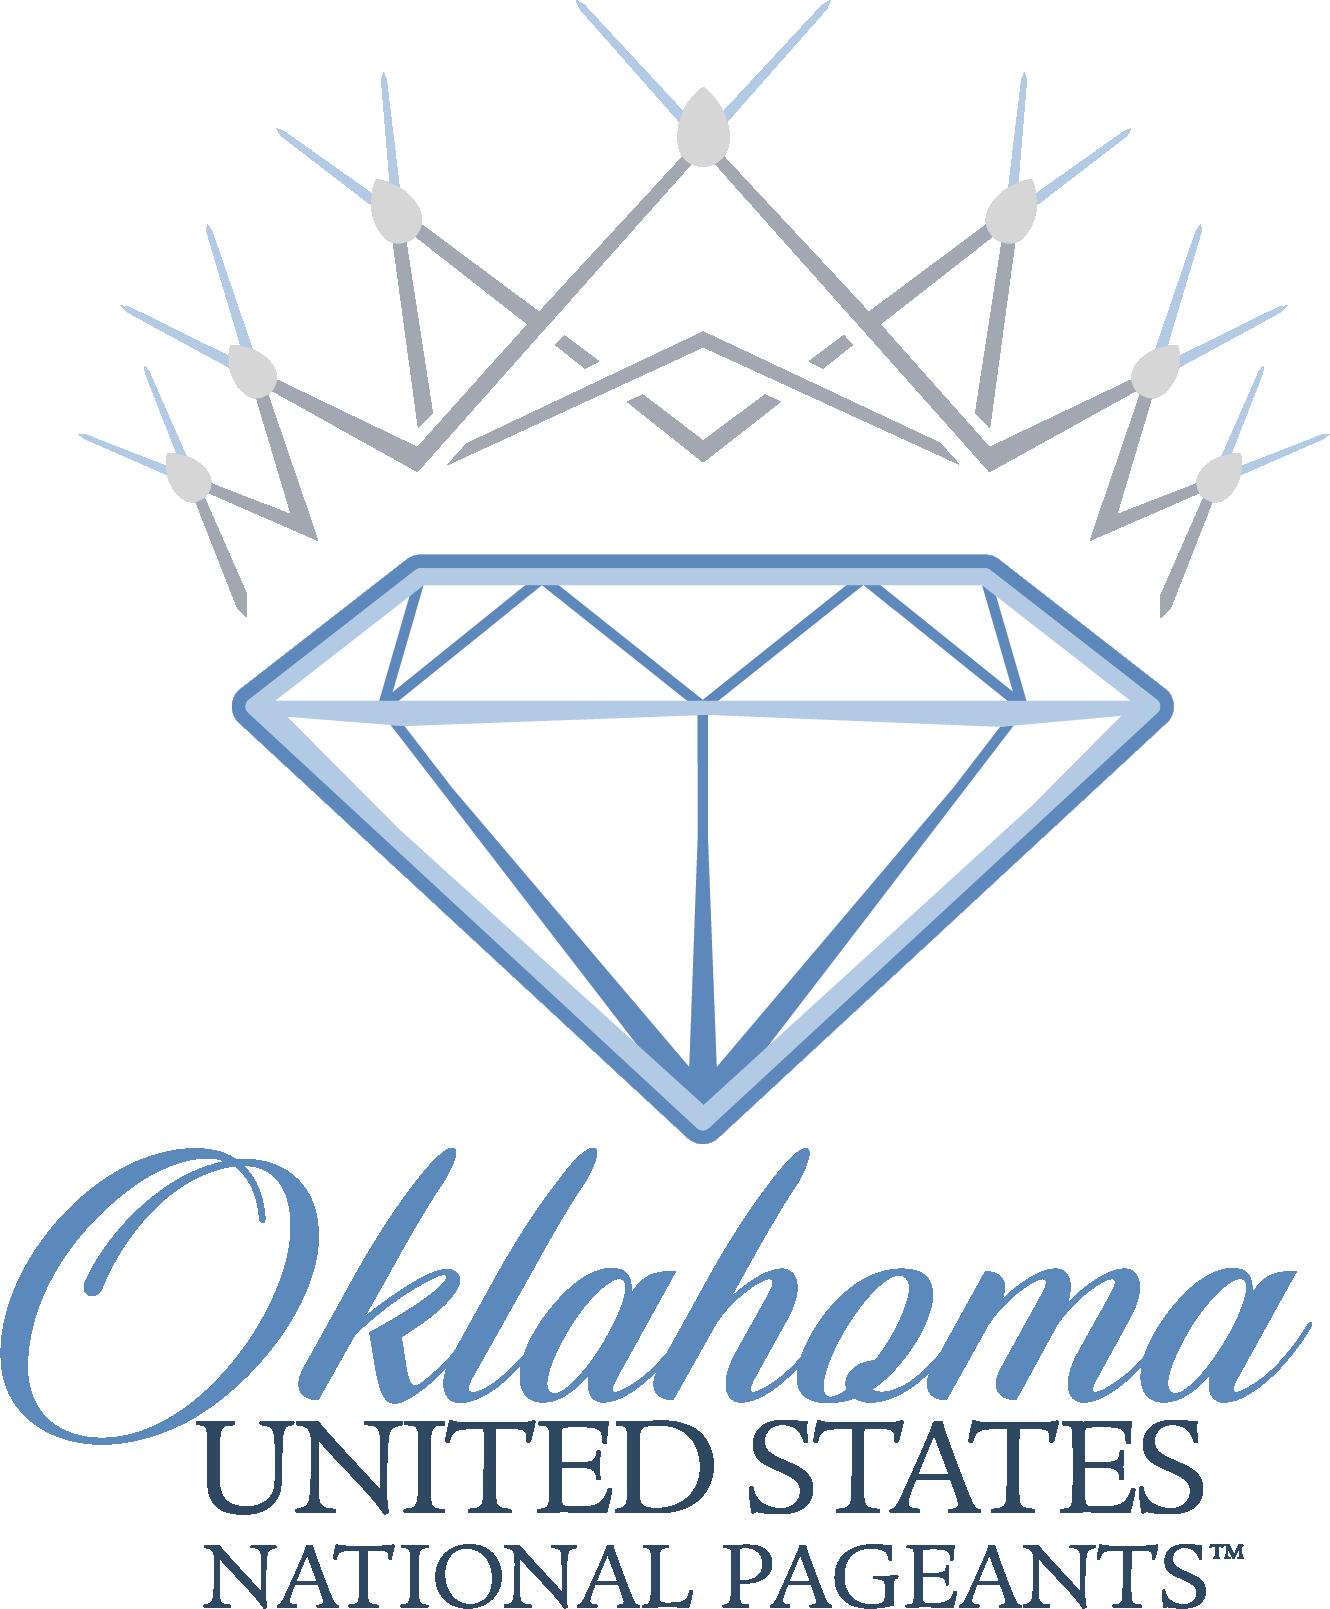 Oklahoma_Vertical_4c